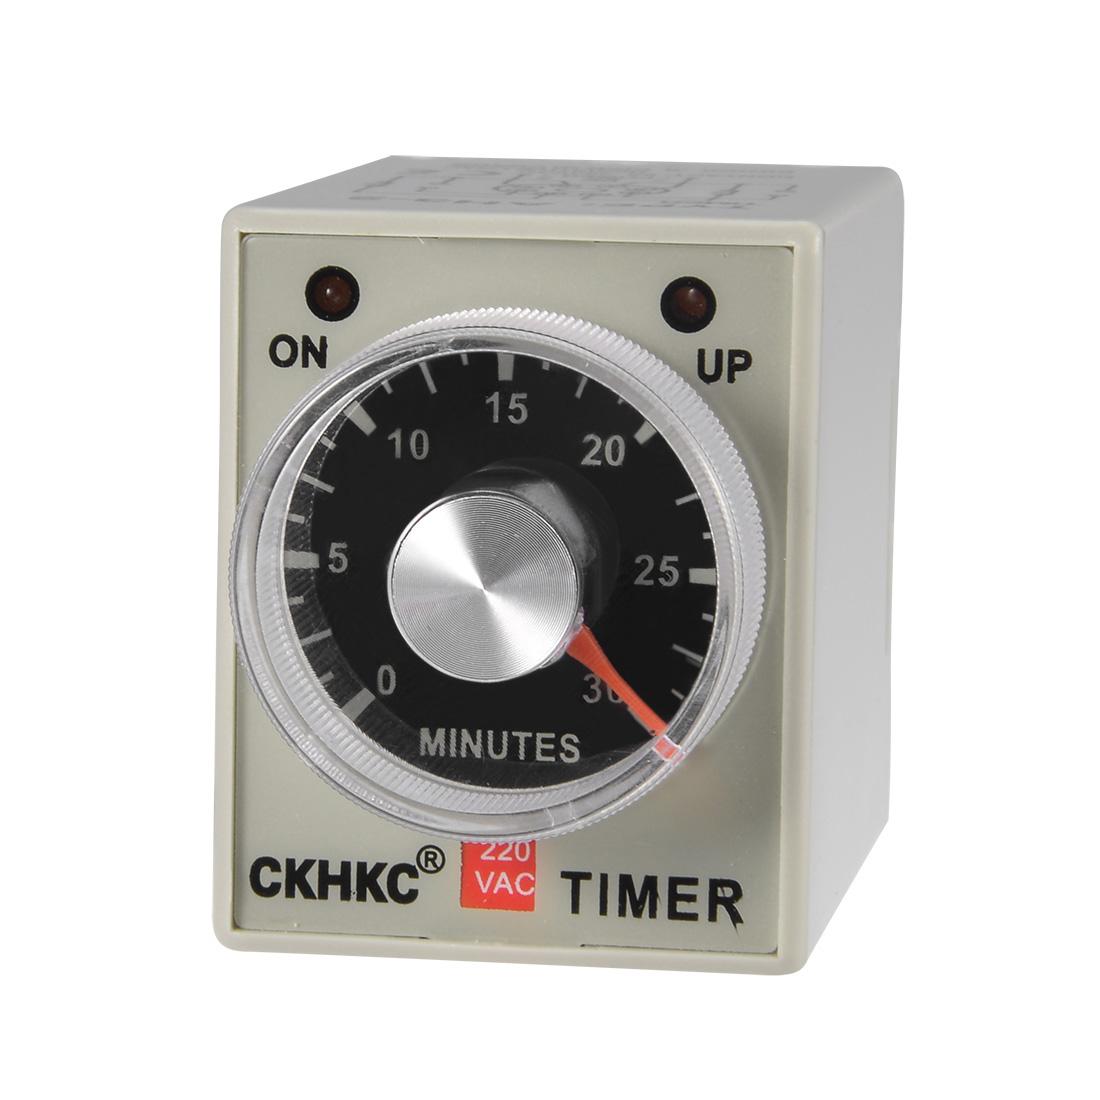 AC220V 30M 8 Terminals Range Adjustable Delay Timer Time Relay AH3-3